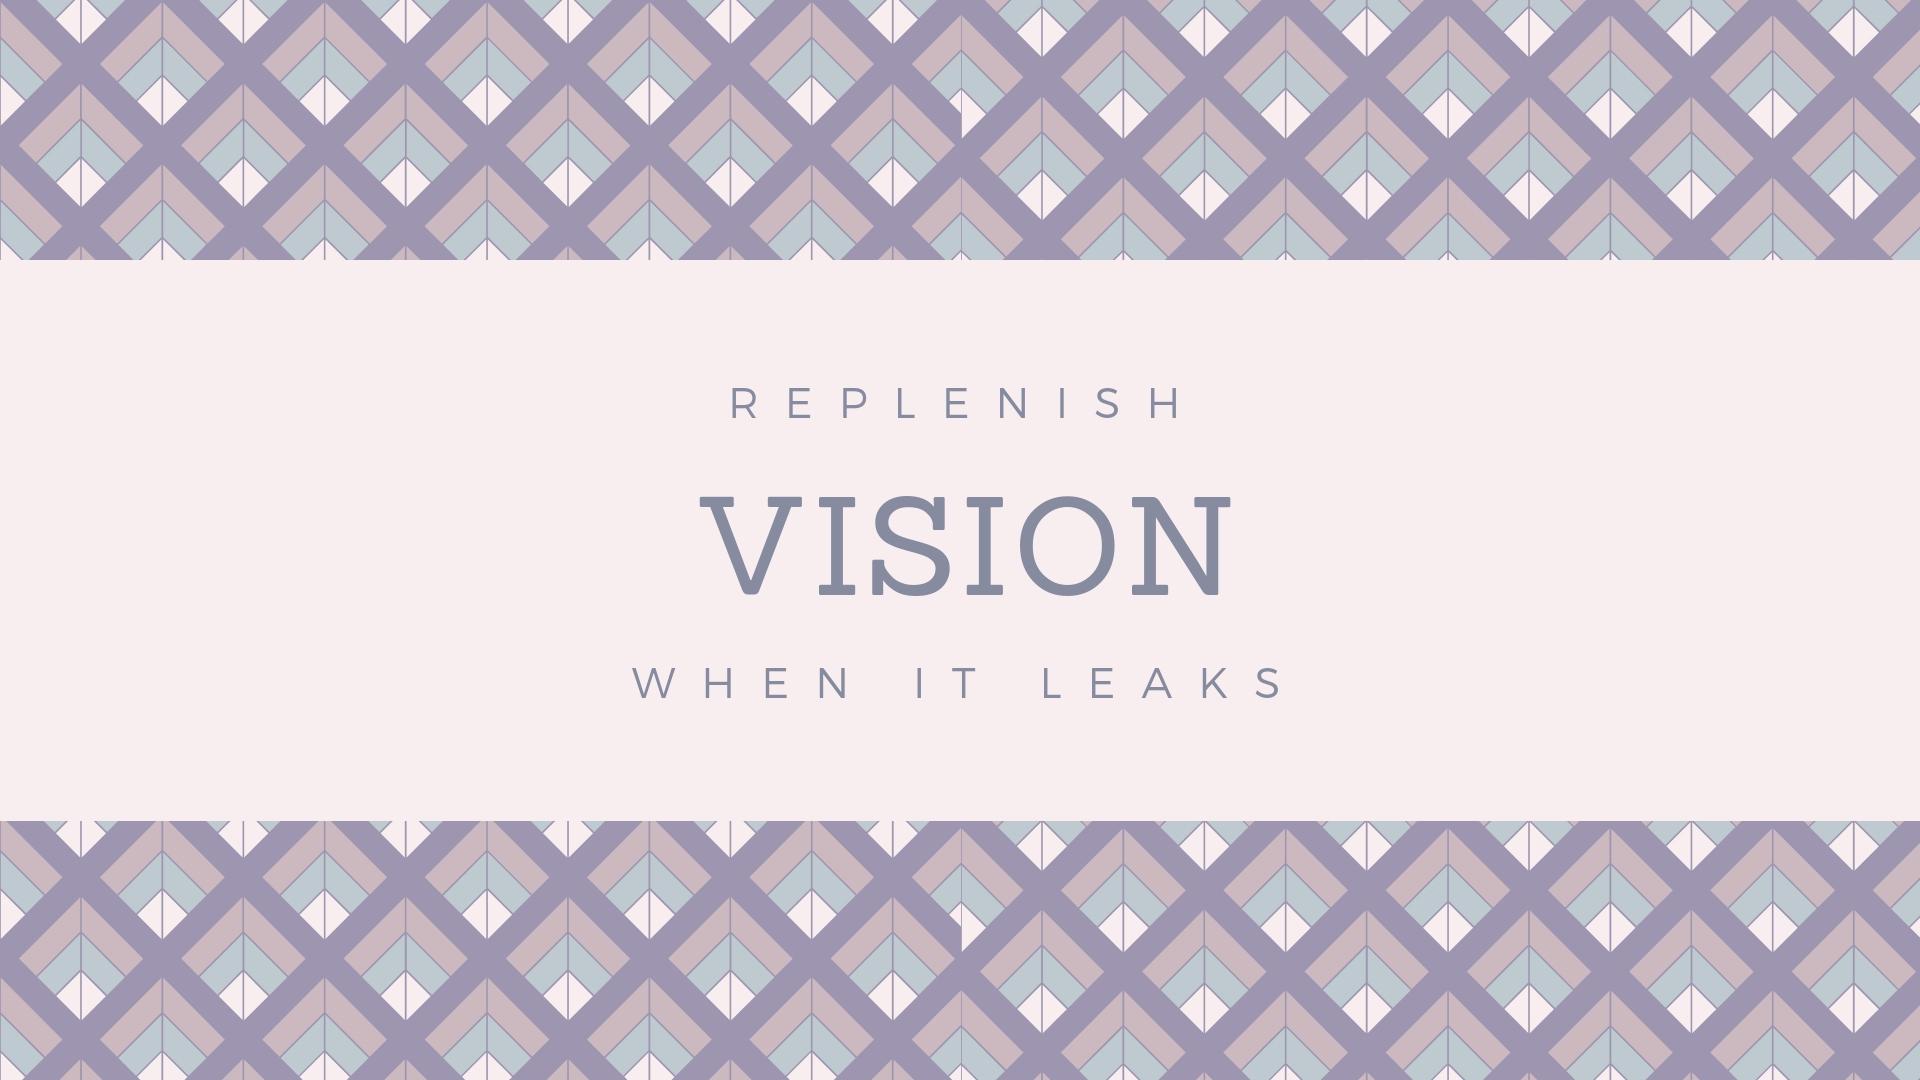 Replenish Vision When it Leaks